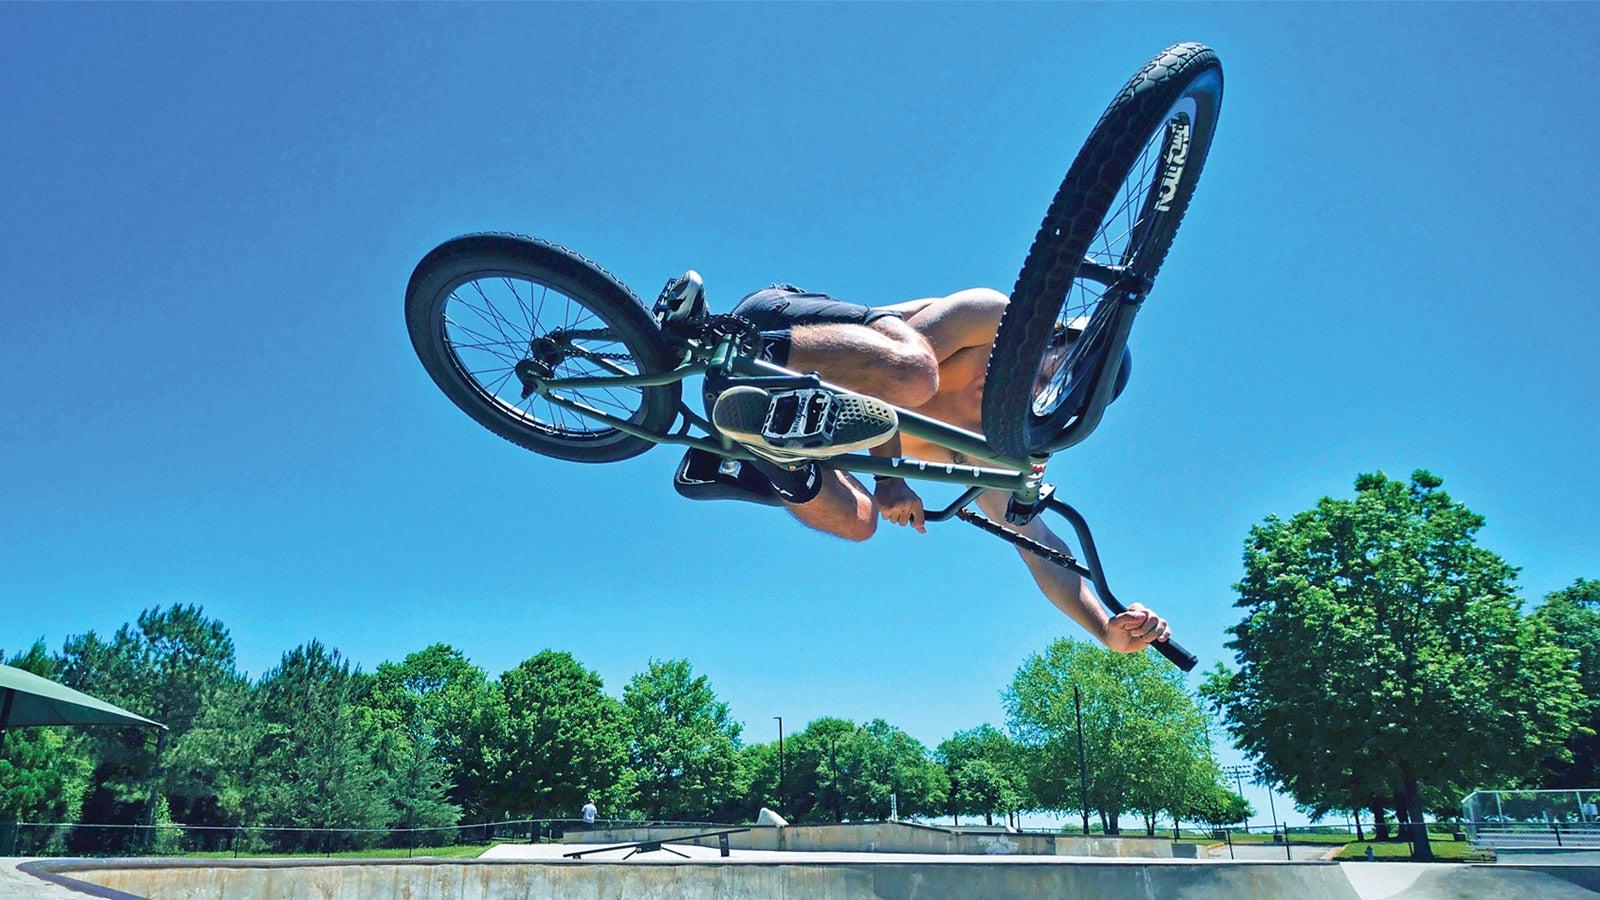 UCF Grad Travels the World to Pursue BMX Passion